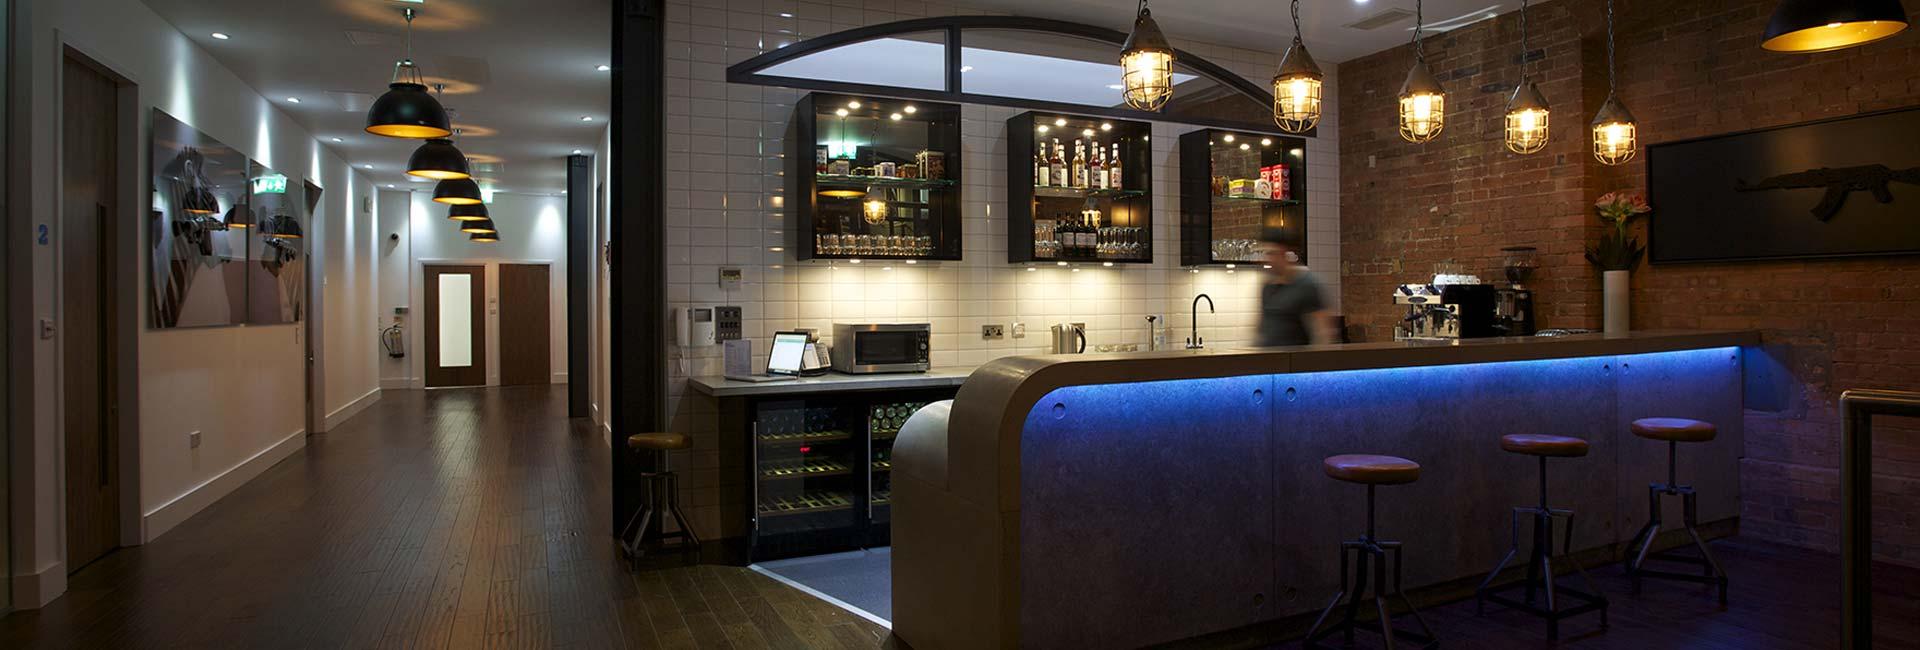 Big Bouy reception and bar